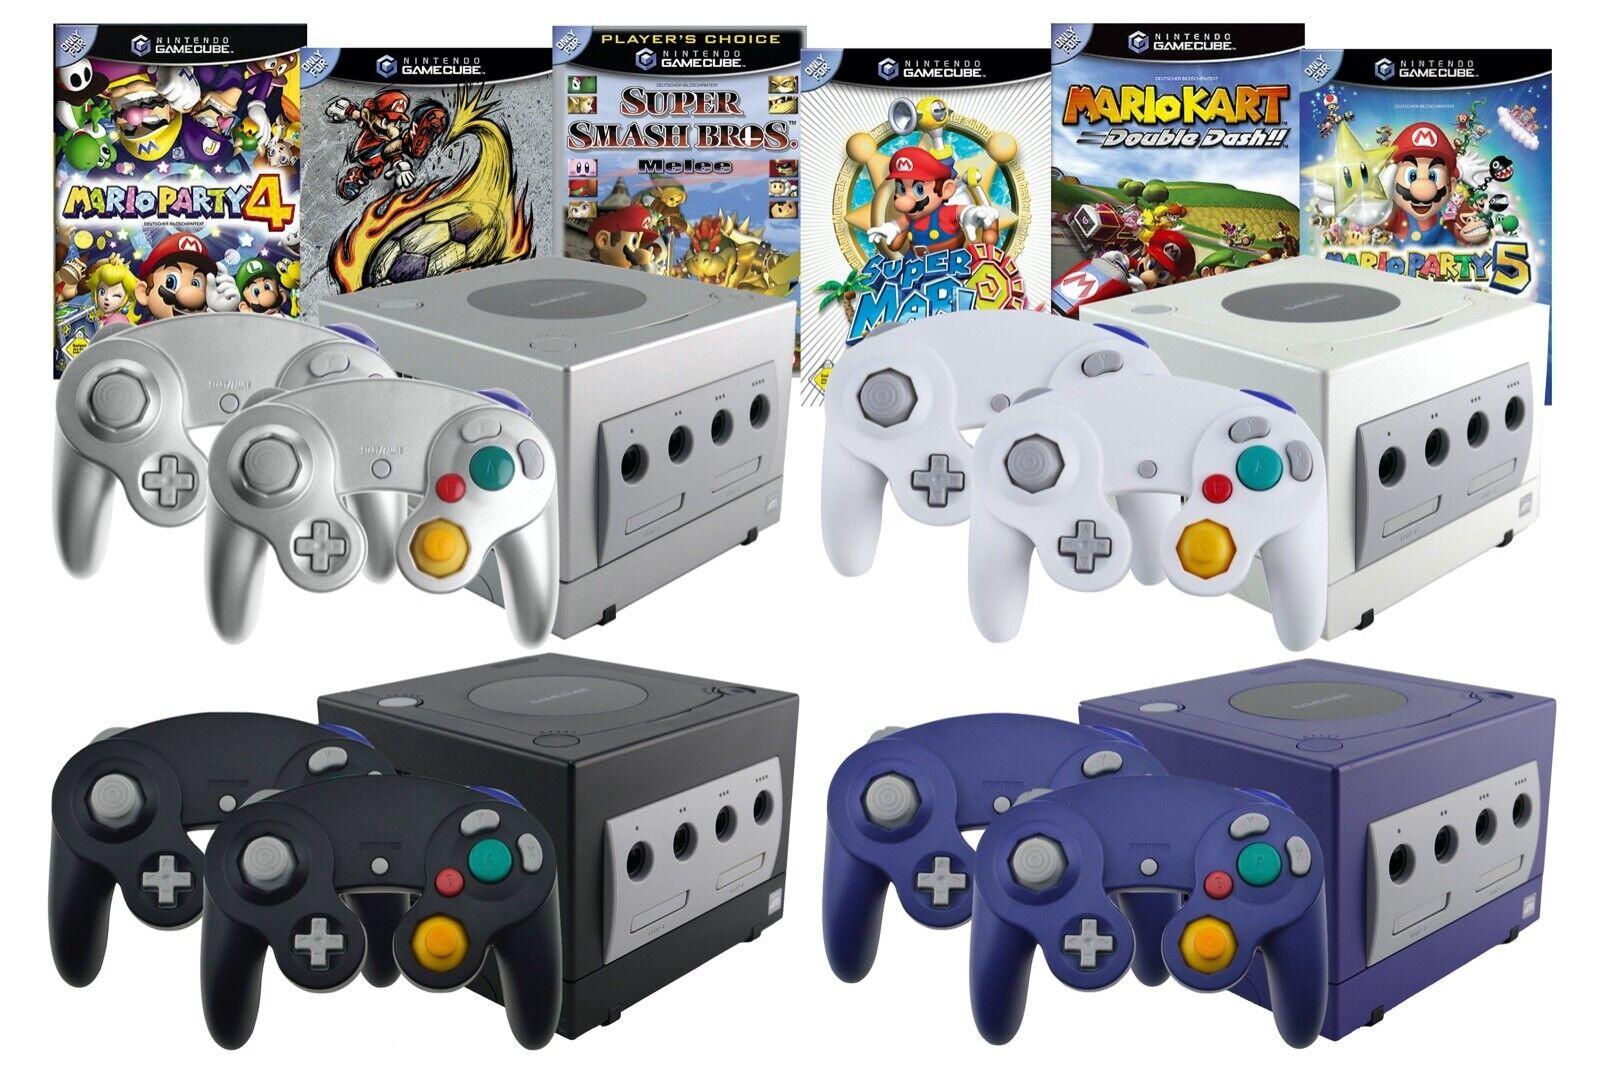 Nintendo GameCube Konsole 1 2 3 4 Controller, Memory, Kabel, Strom & Spiel